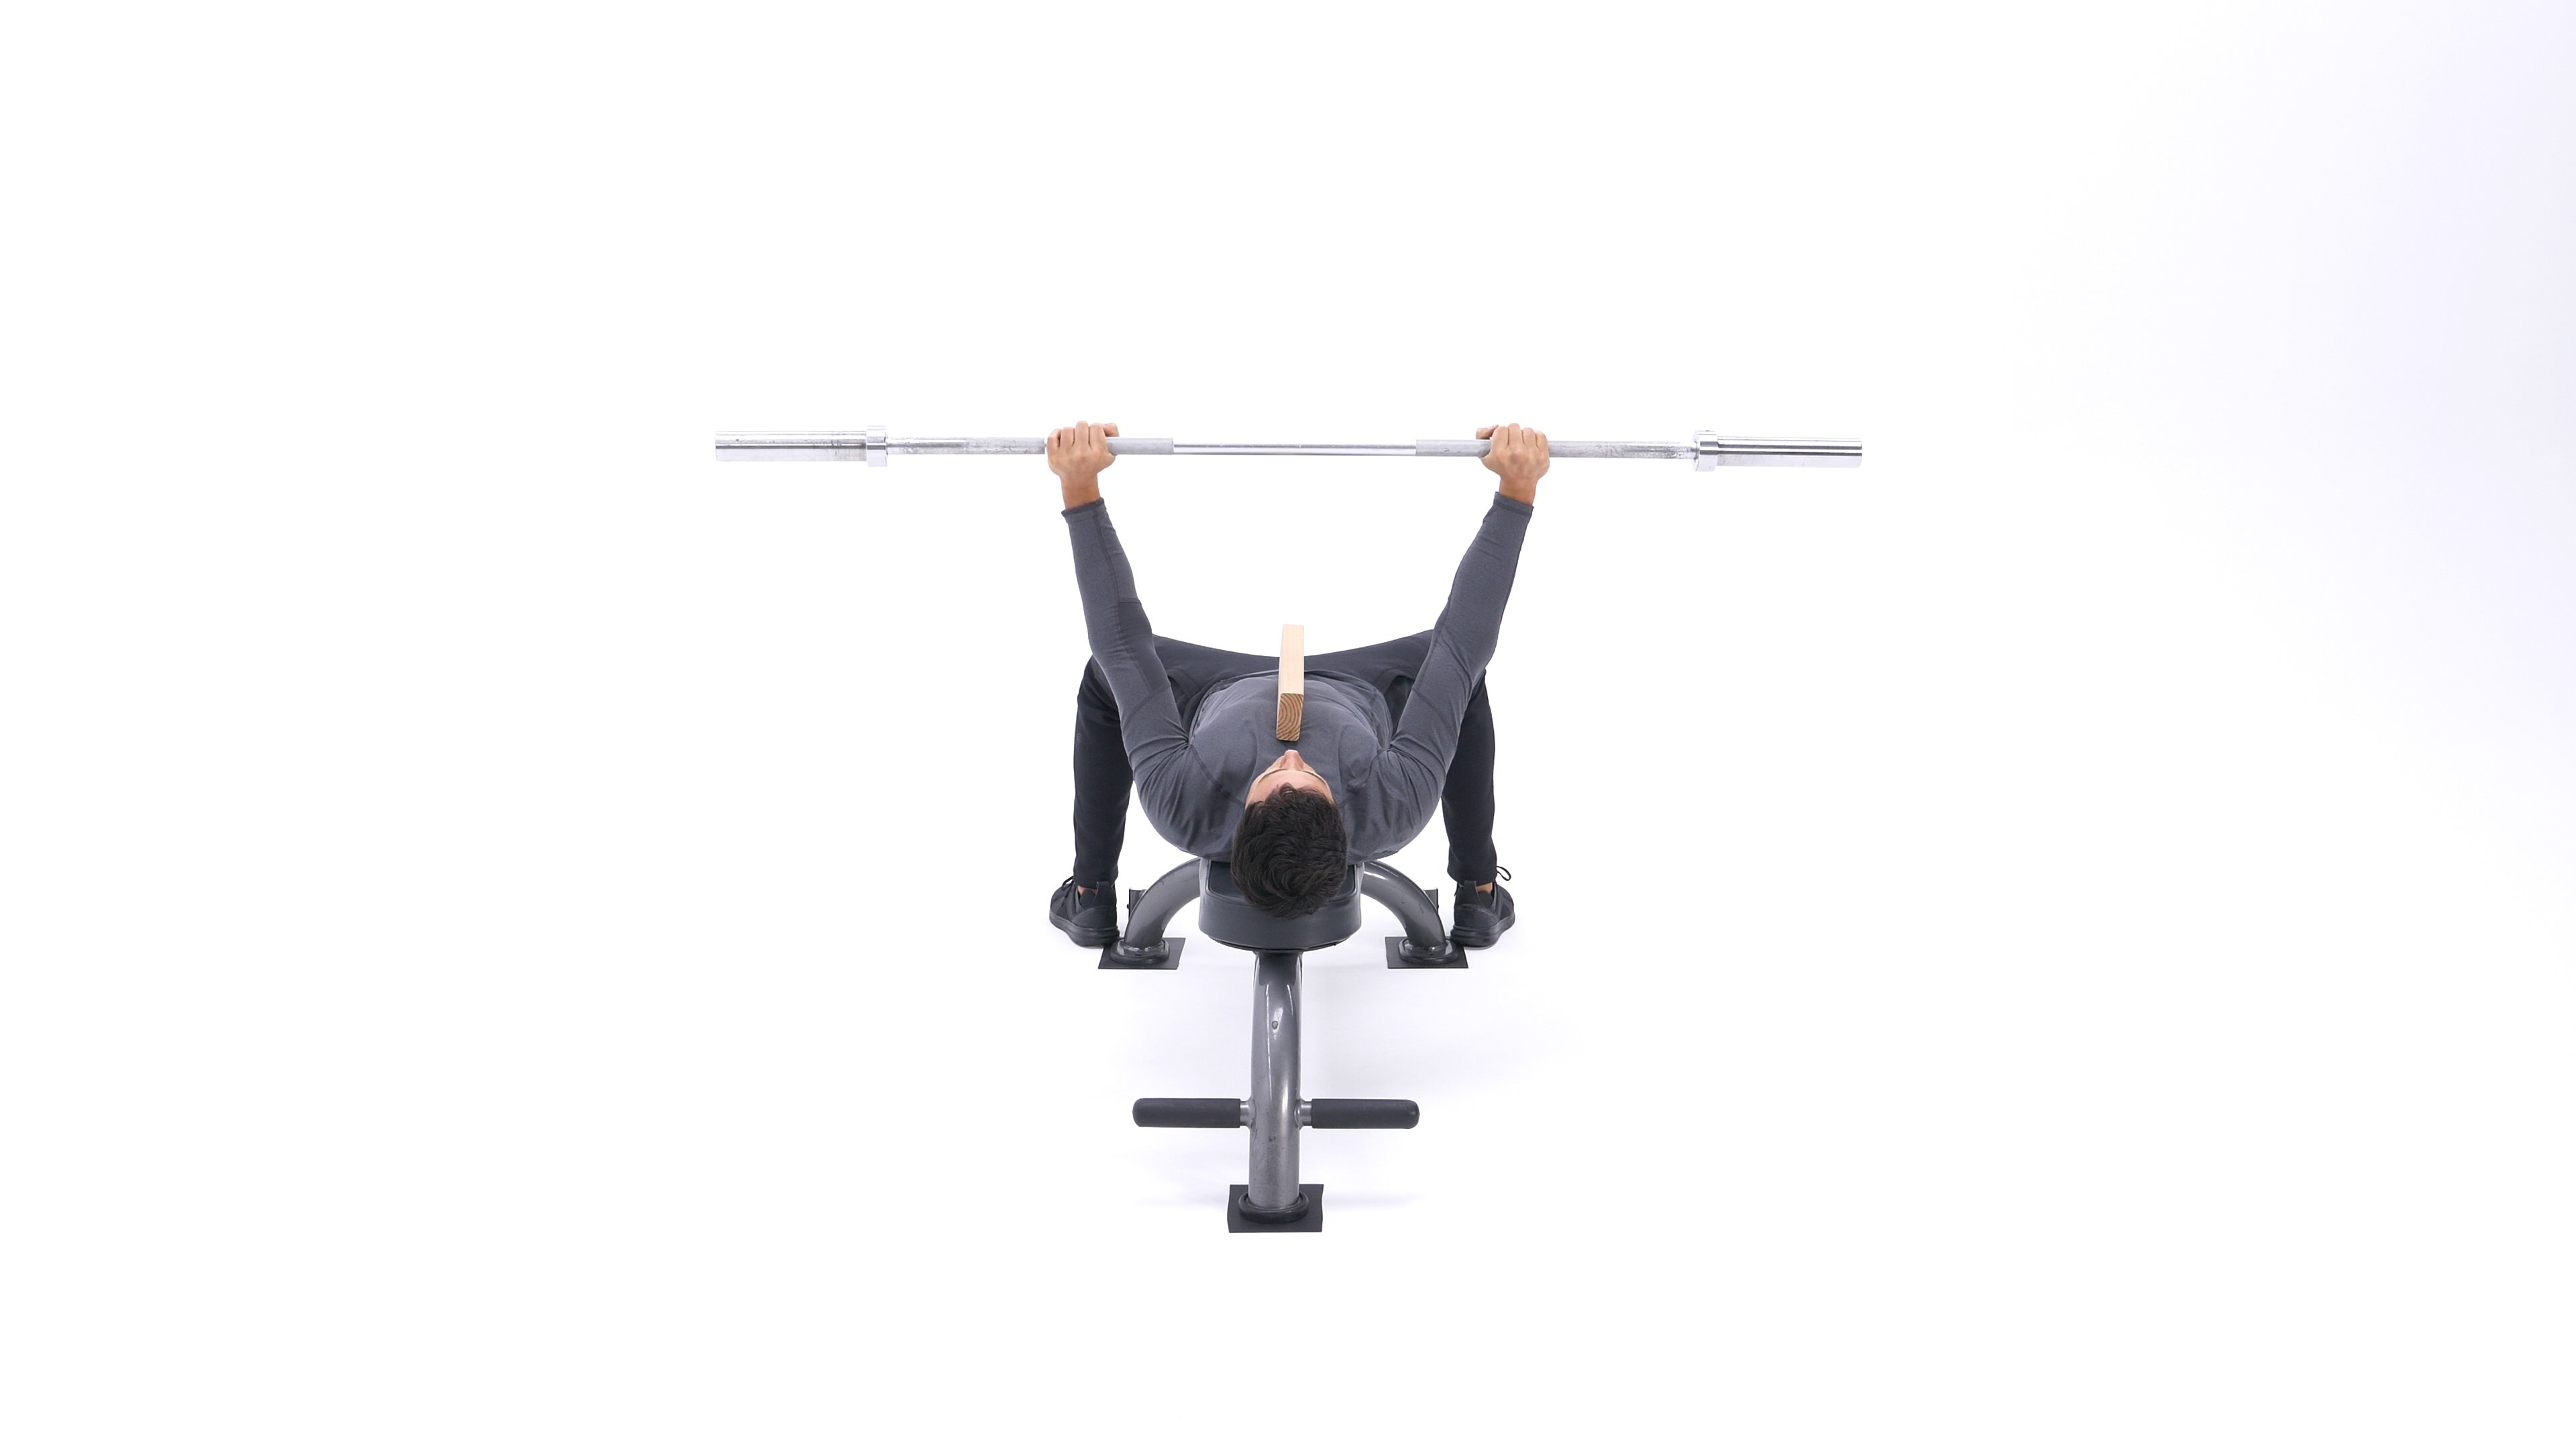 Board bench press image